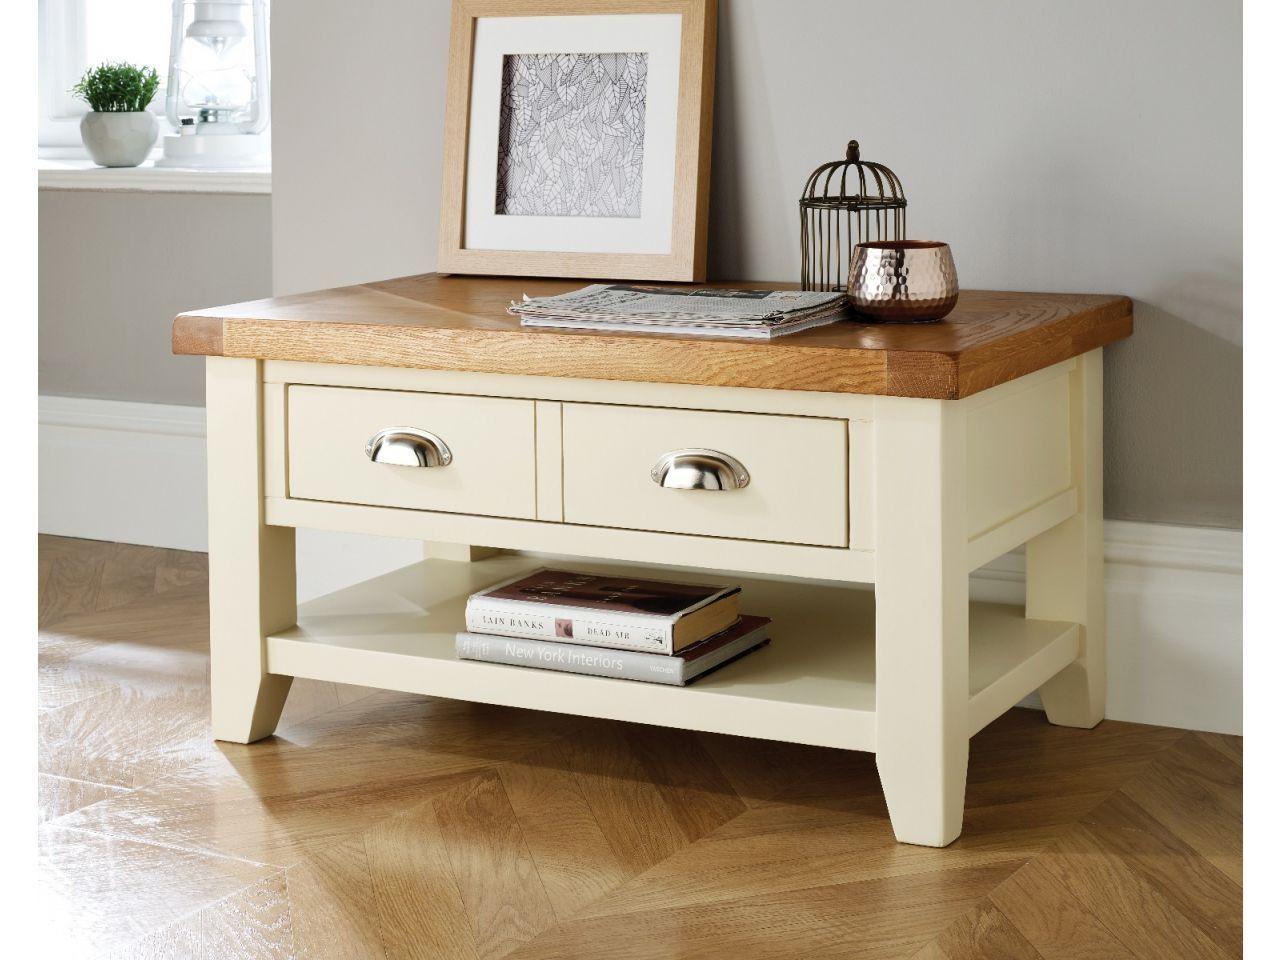 The Stunning Cream Painted Country Cottage Oak Coffee Table With Drawer This Coffee Table Is An Couchtisch Mit Schublade Couchtisch Bemalen Wohnzimmertische